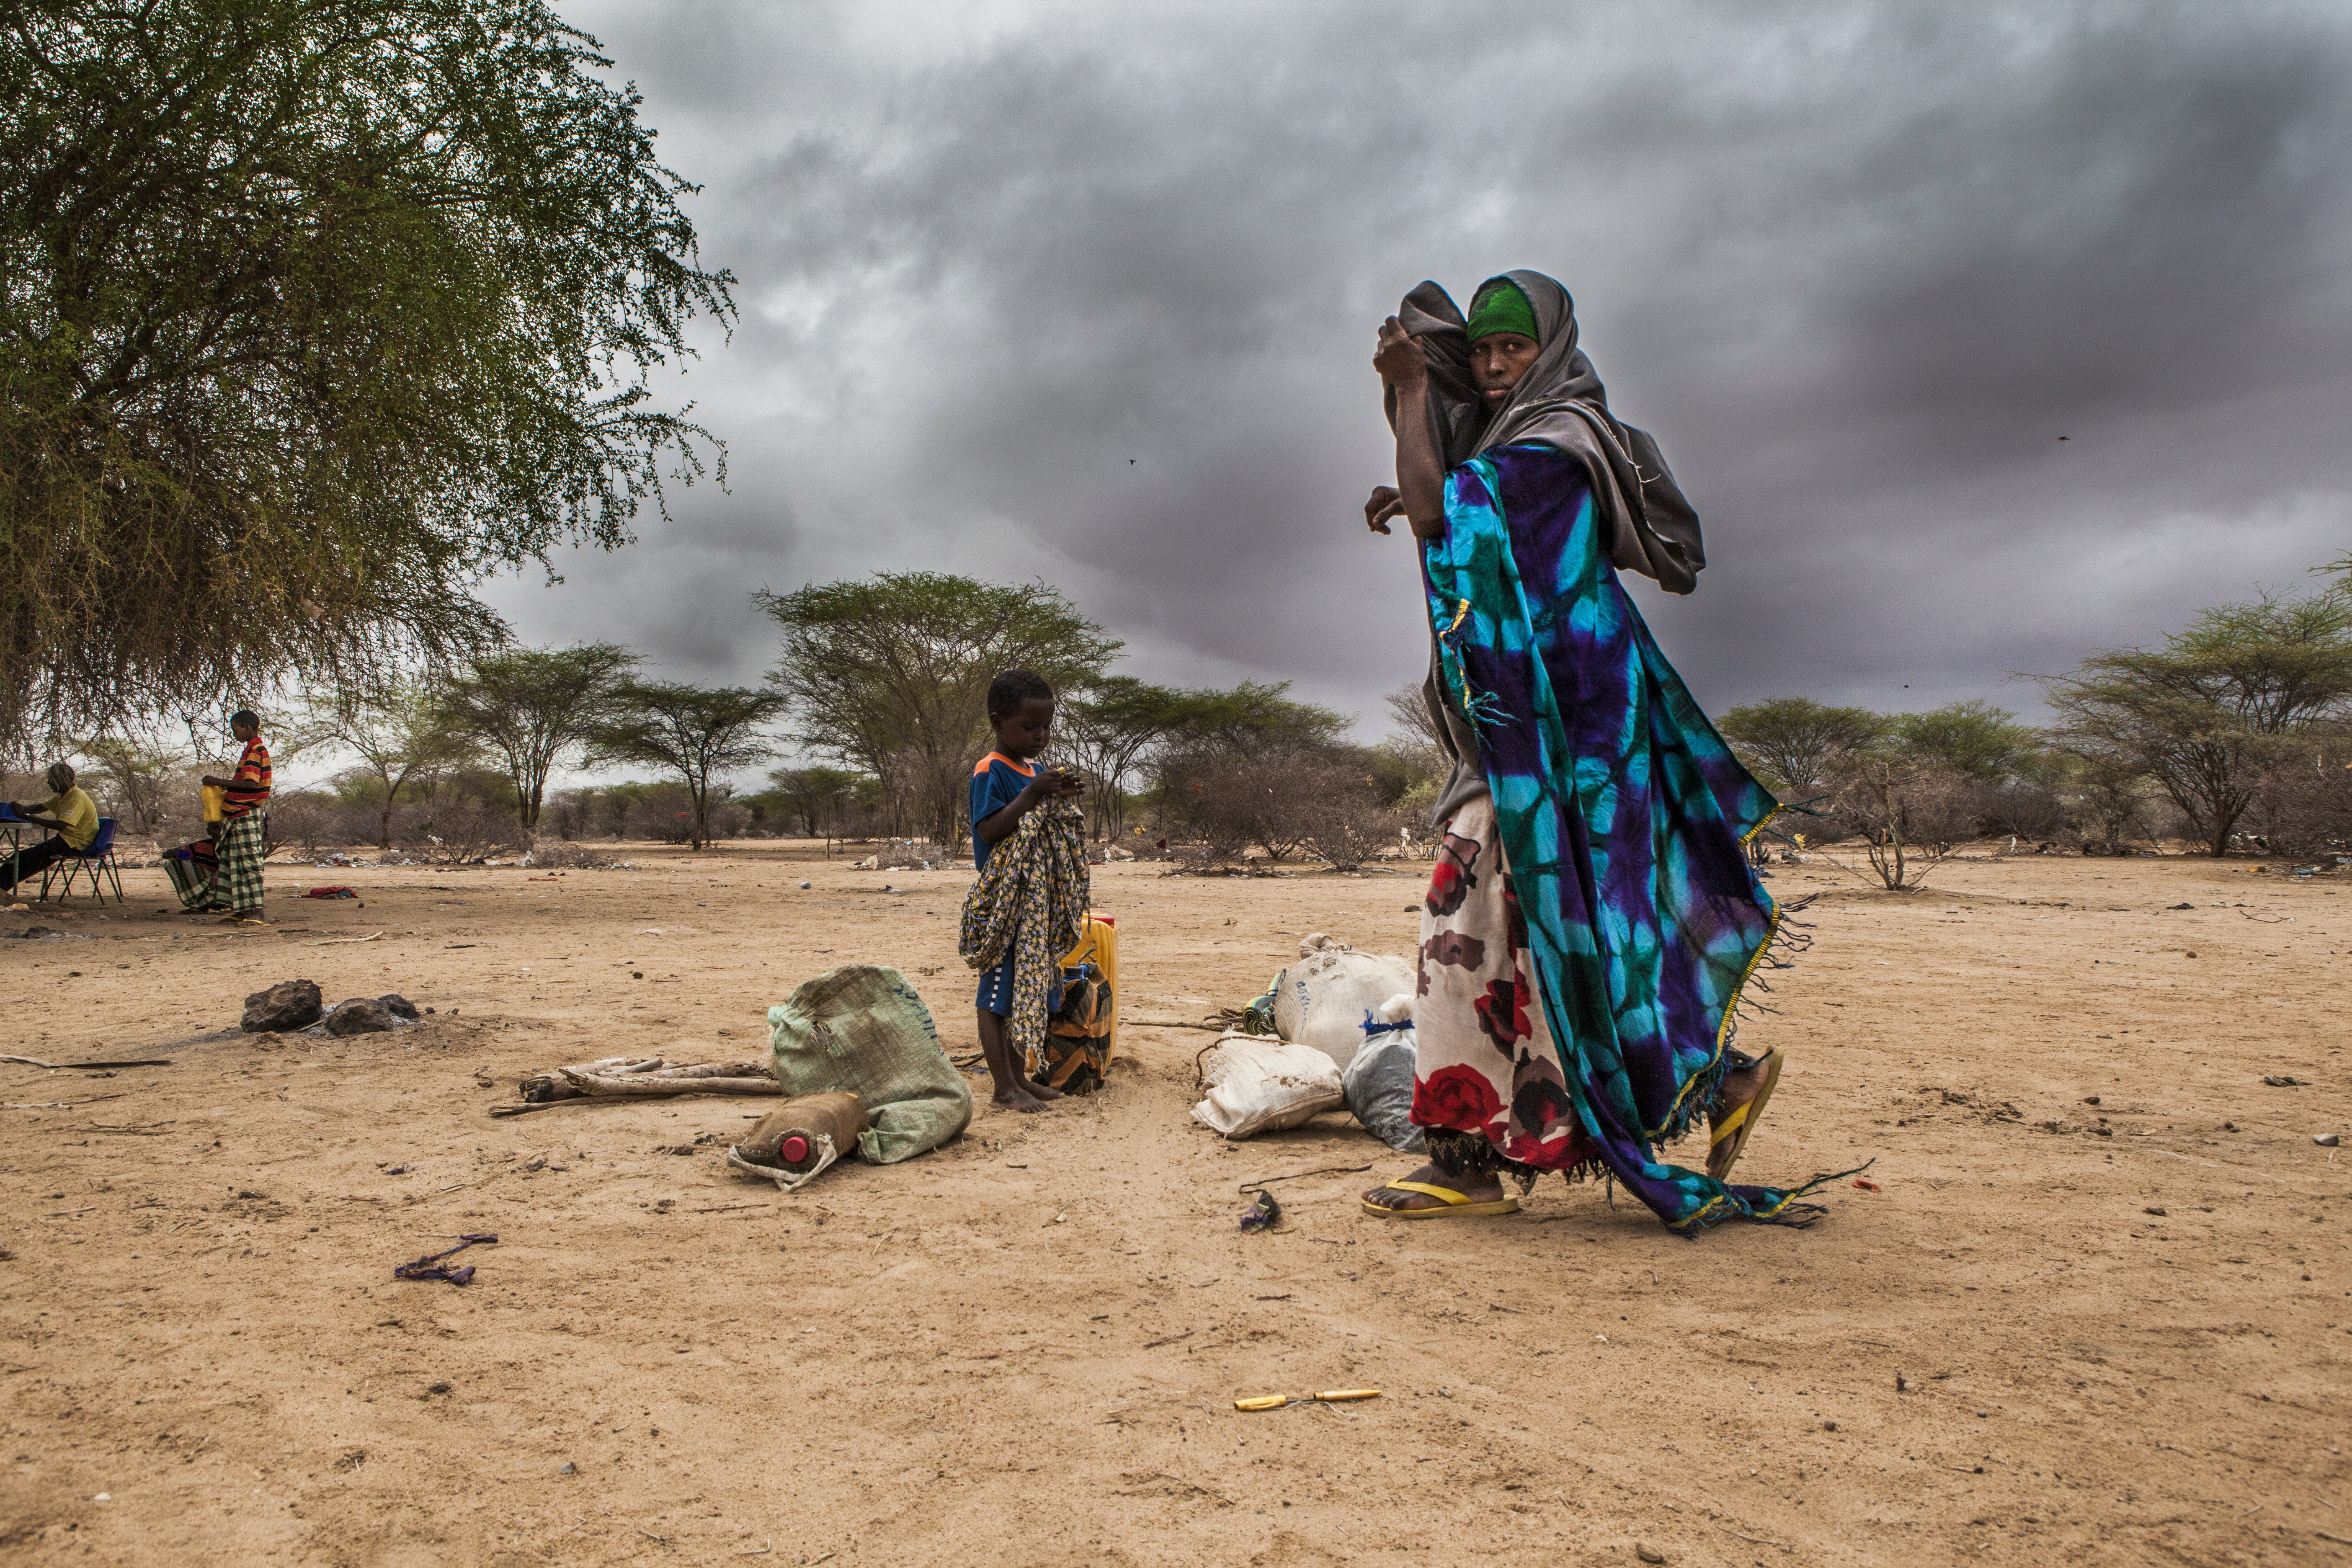 Somali Journeys of Belonging by Salym Fayad Thru 6/3